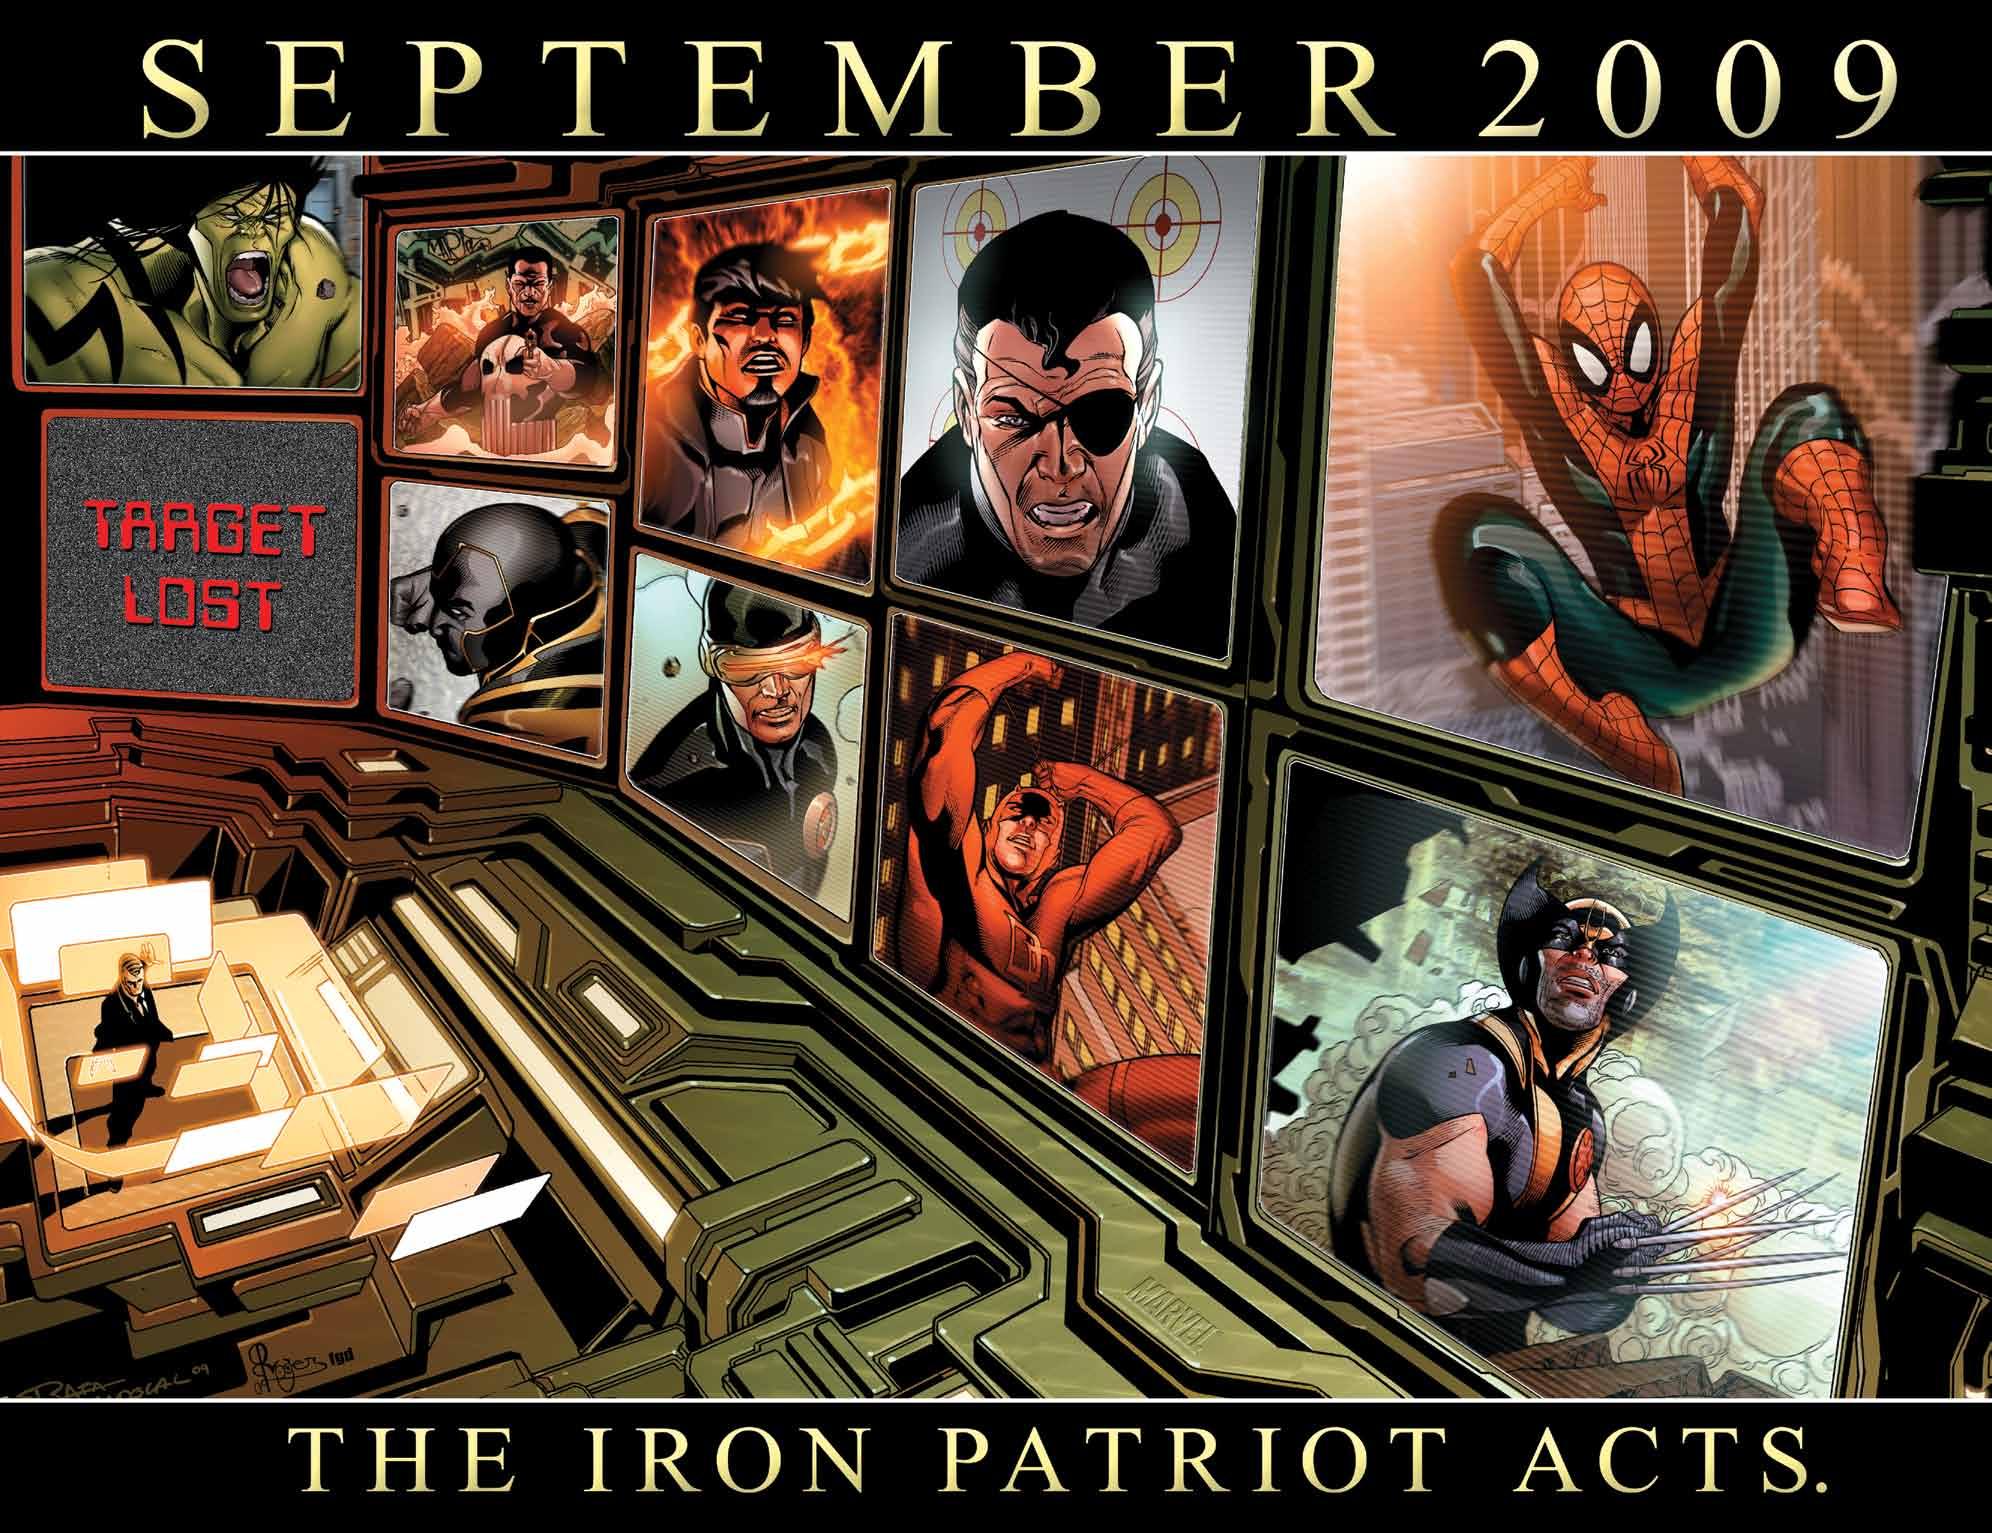 september2009theironpatriotacts.jpg